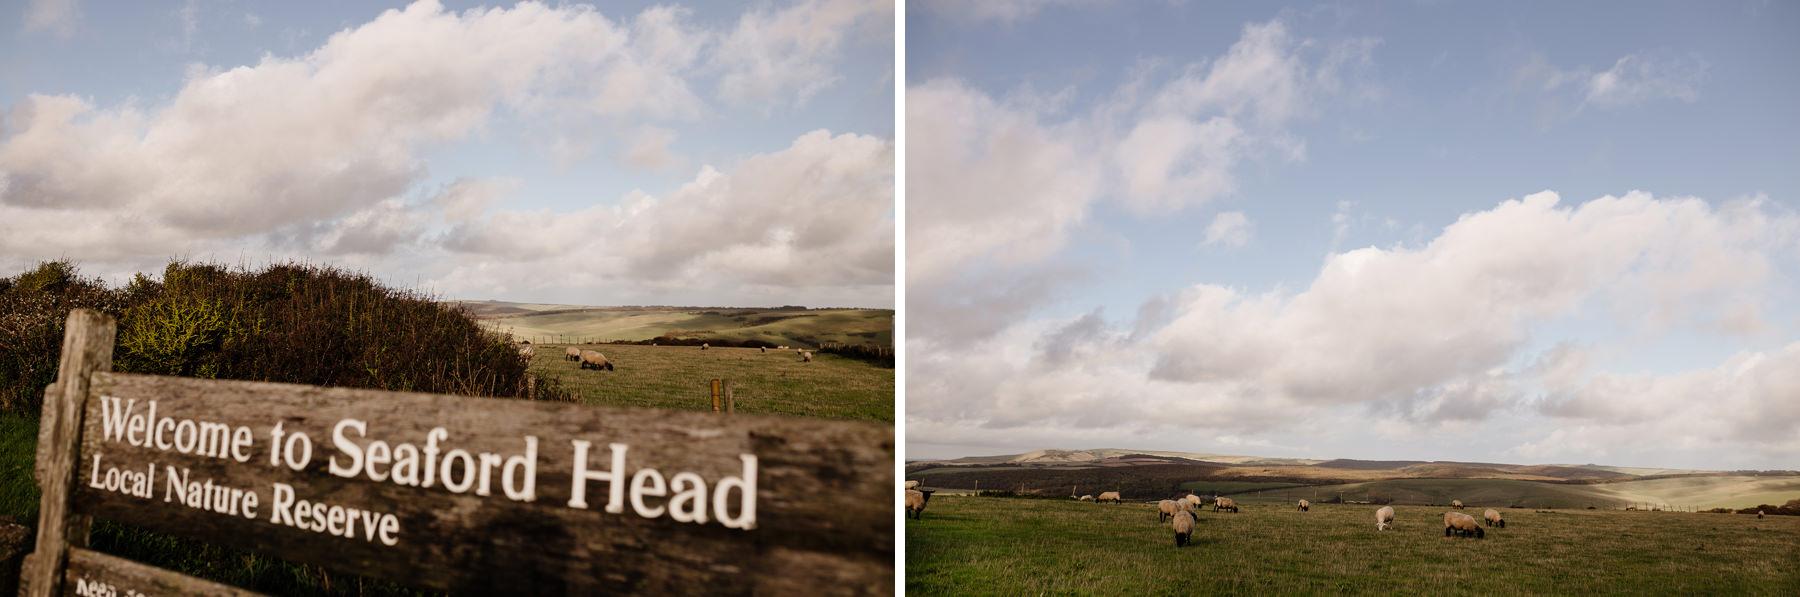 seaford head uk